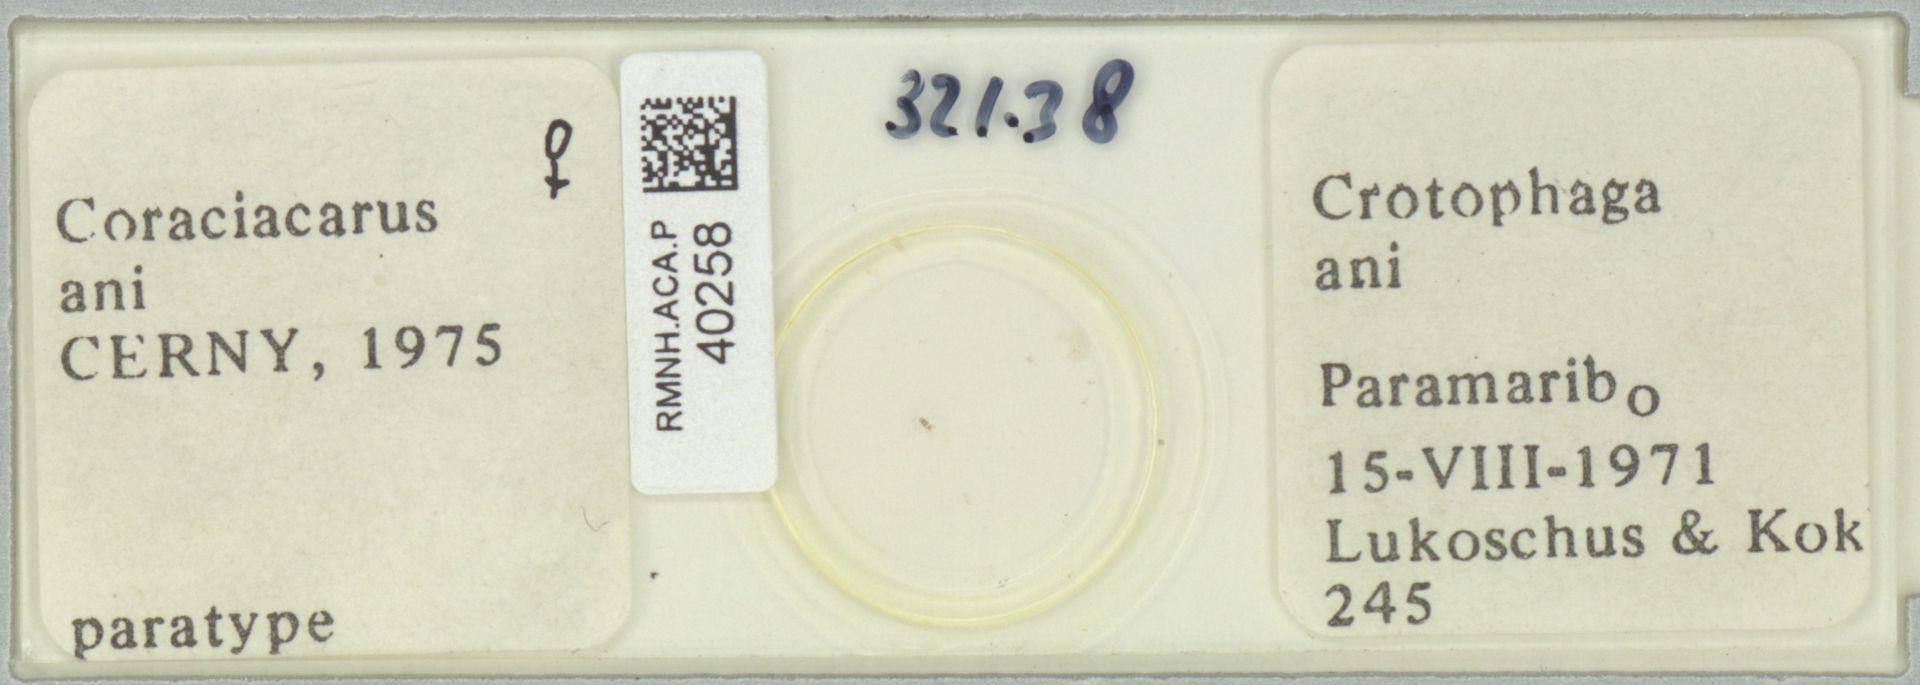 RMNH.ACA.P.40258   Coraciacarus ani Cerny, 1975